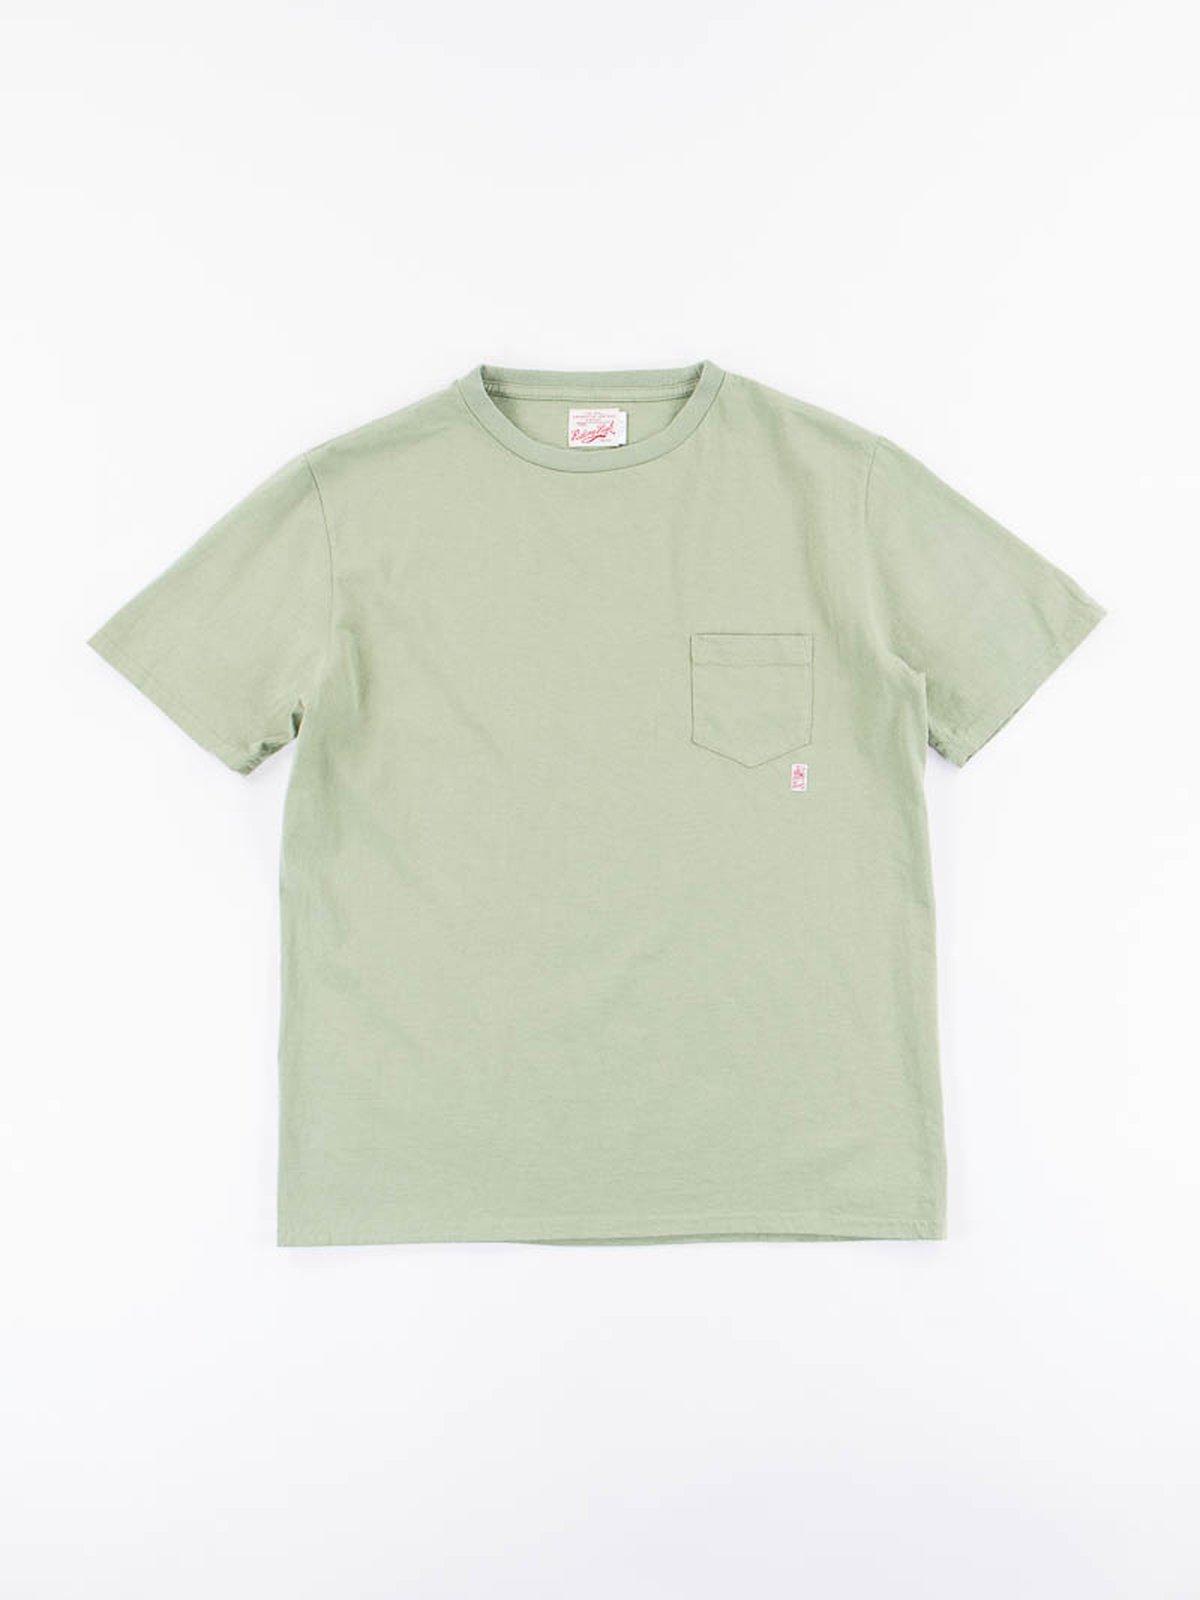 Green Standard Pack Pocket Tee - Image 1